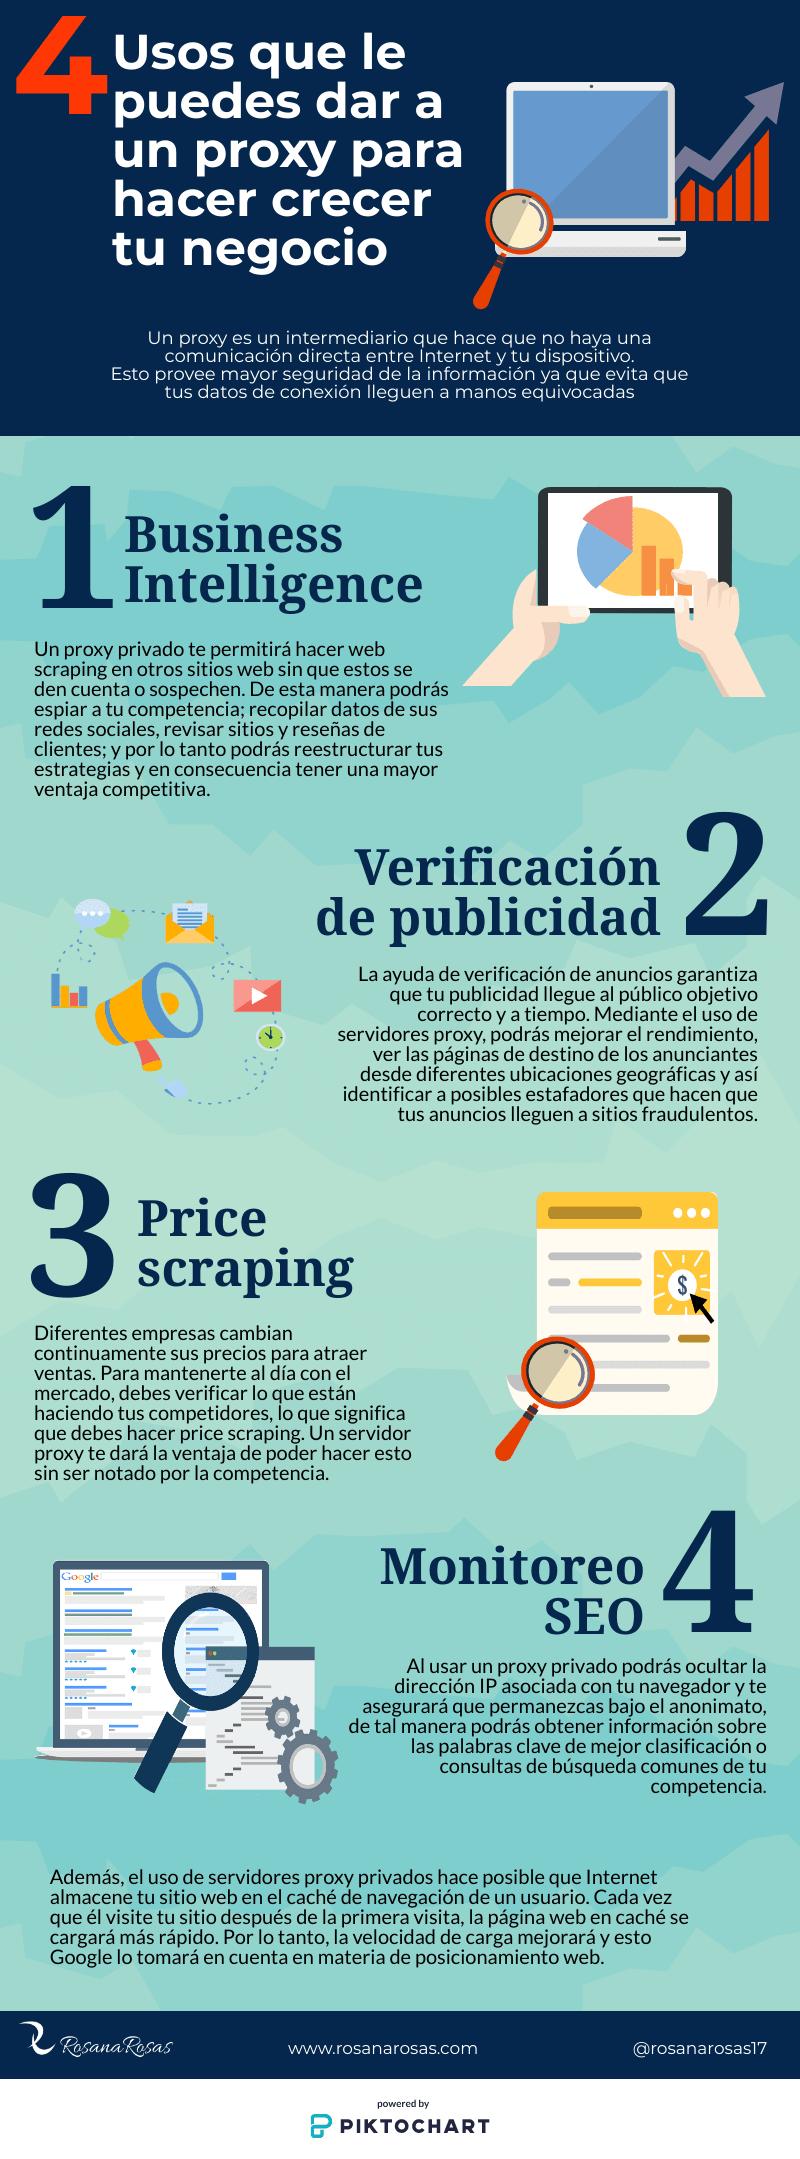 Infografia 4 Usos de un proxy para hacer crecer tu negocio